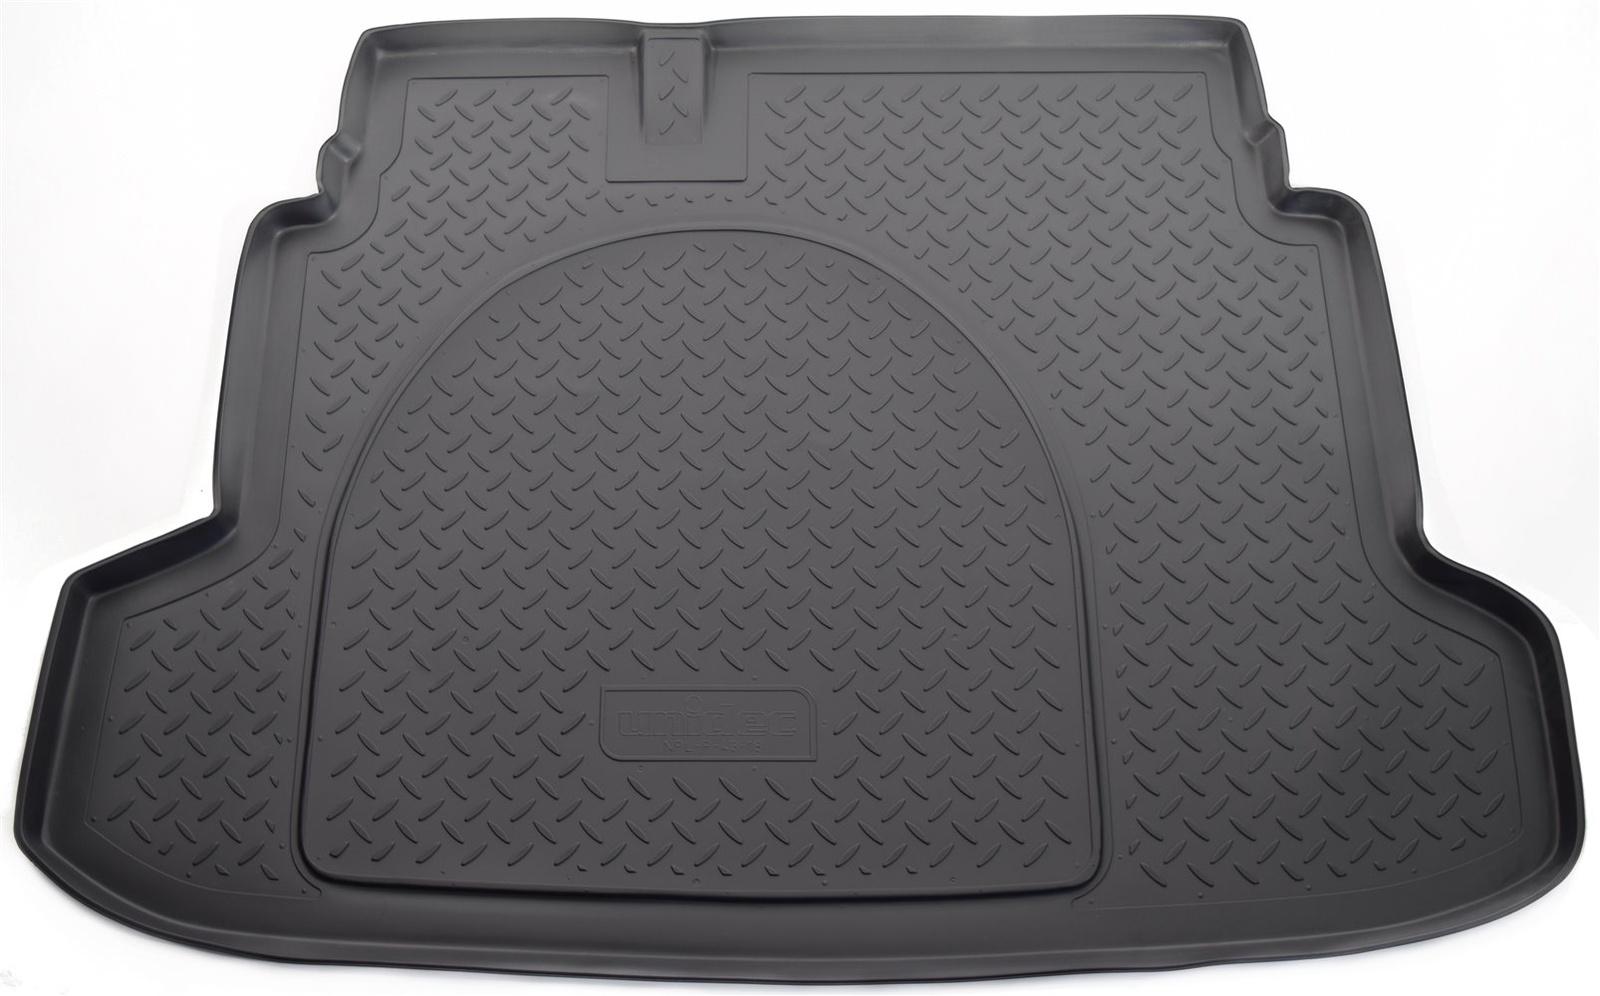 Коврик багажника Norplast для Kia Cerato TD SD 2009-2013, NPL-P-43-18, черный